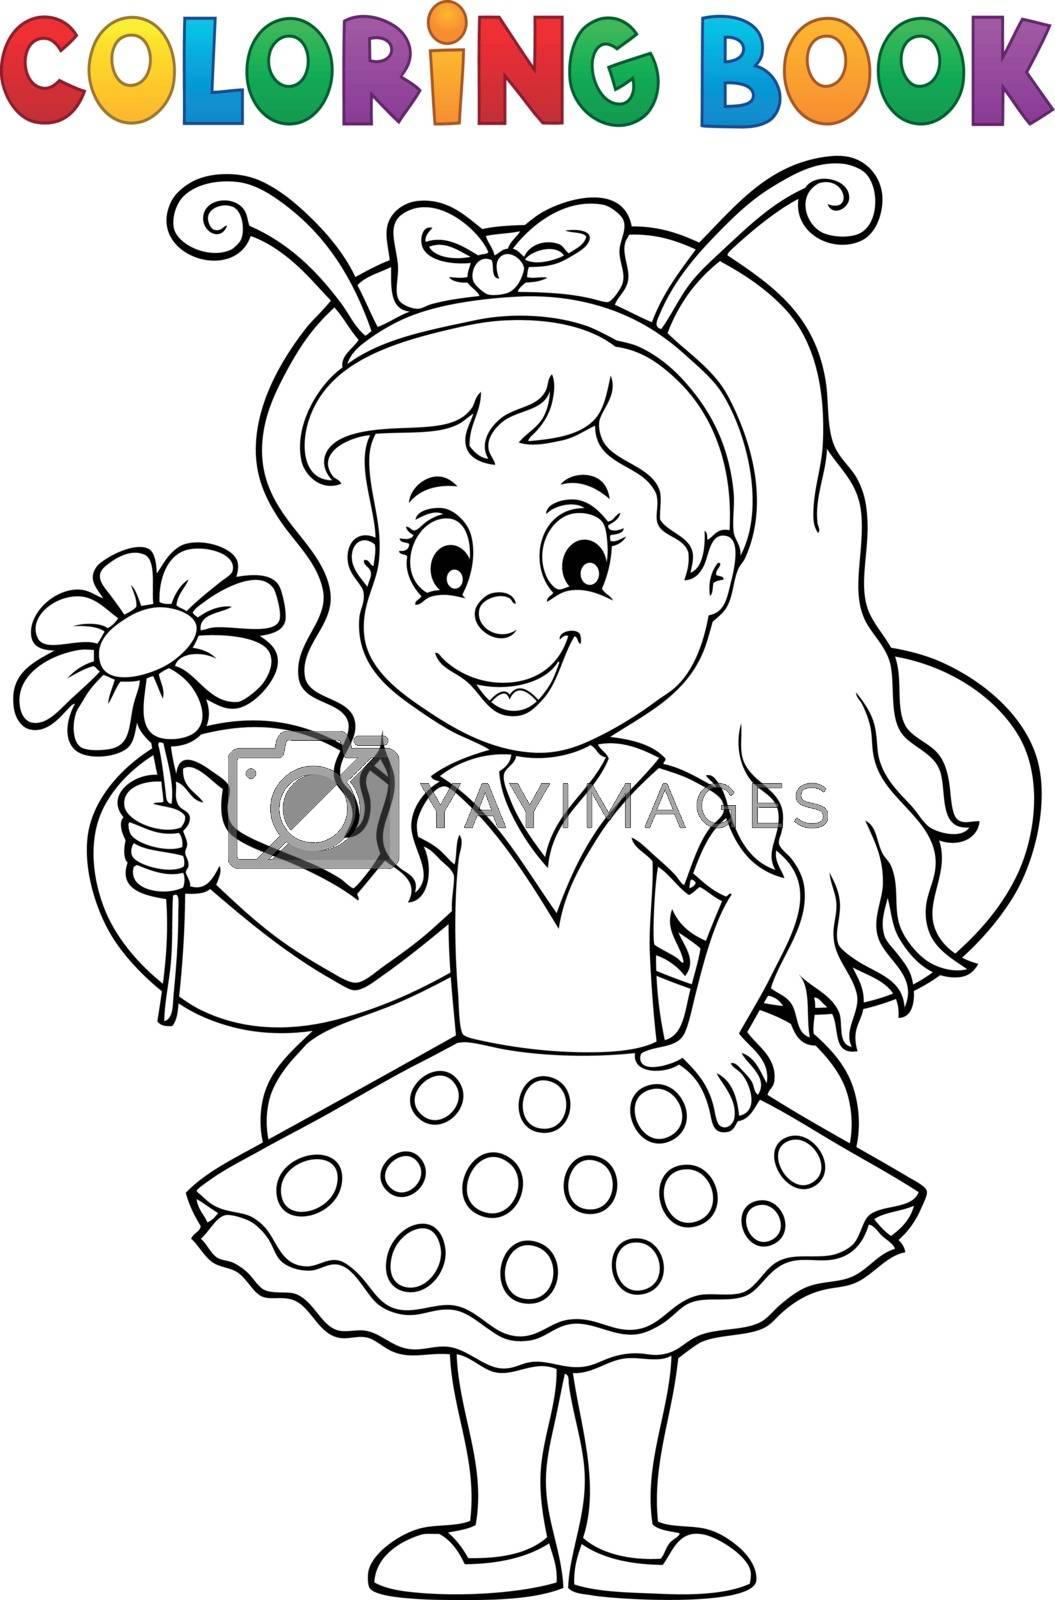 Coloring book ladybug girl theme 1 - eps10 vector illustration.